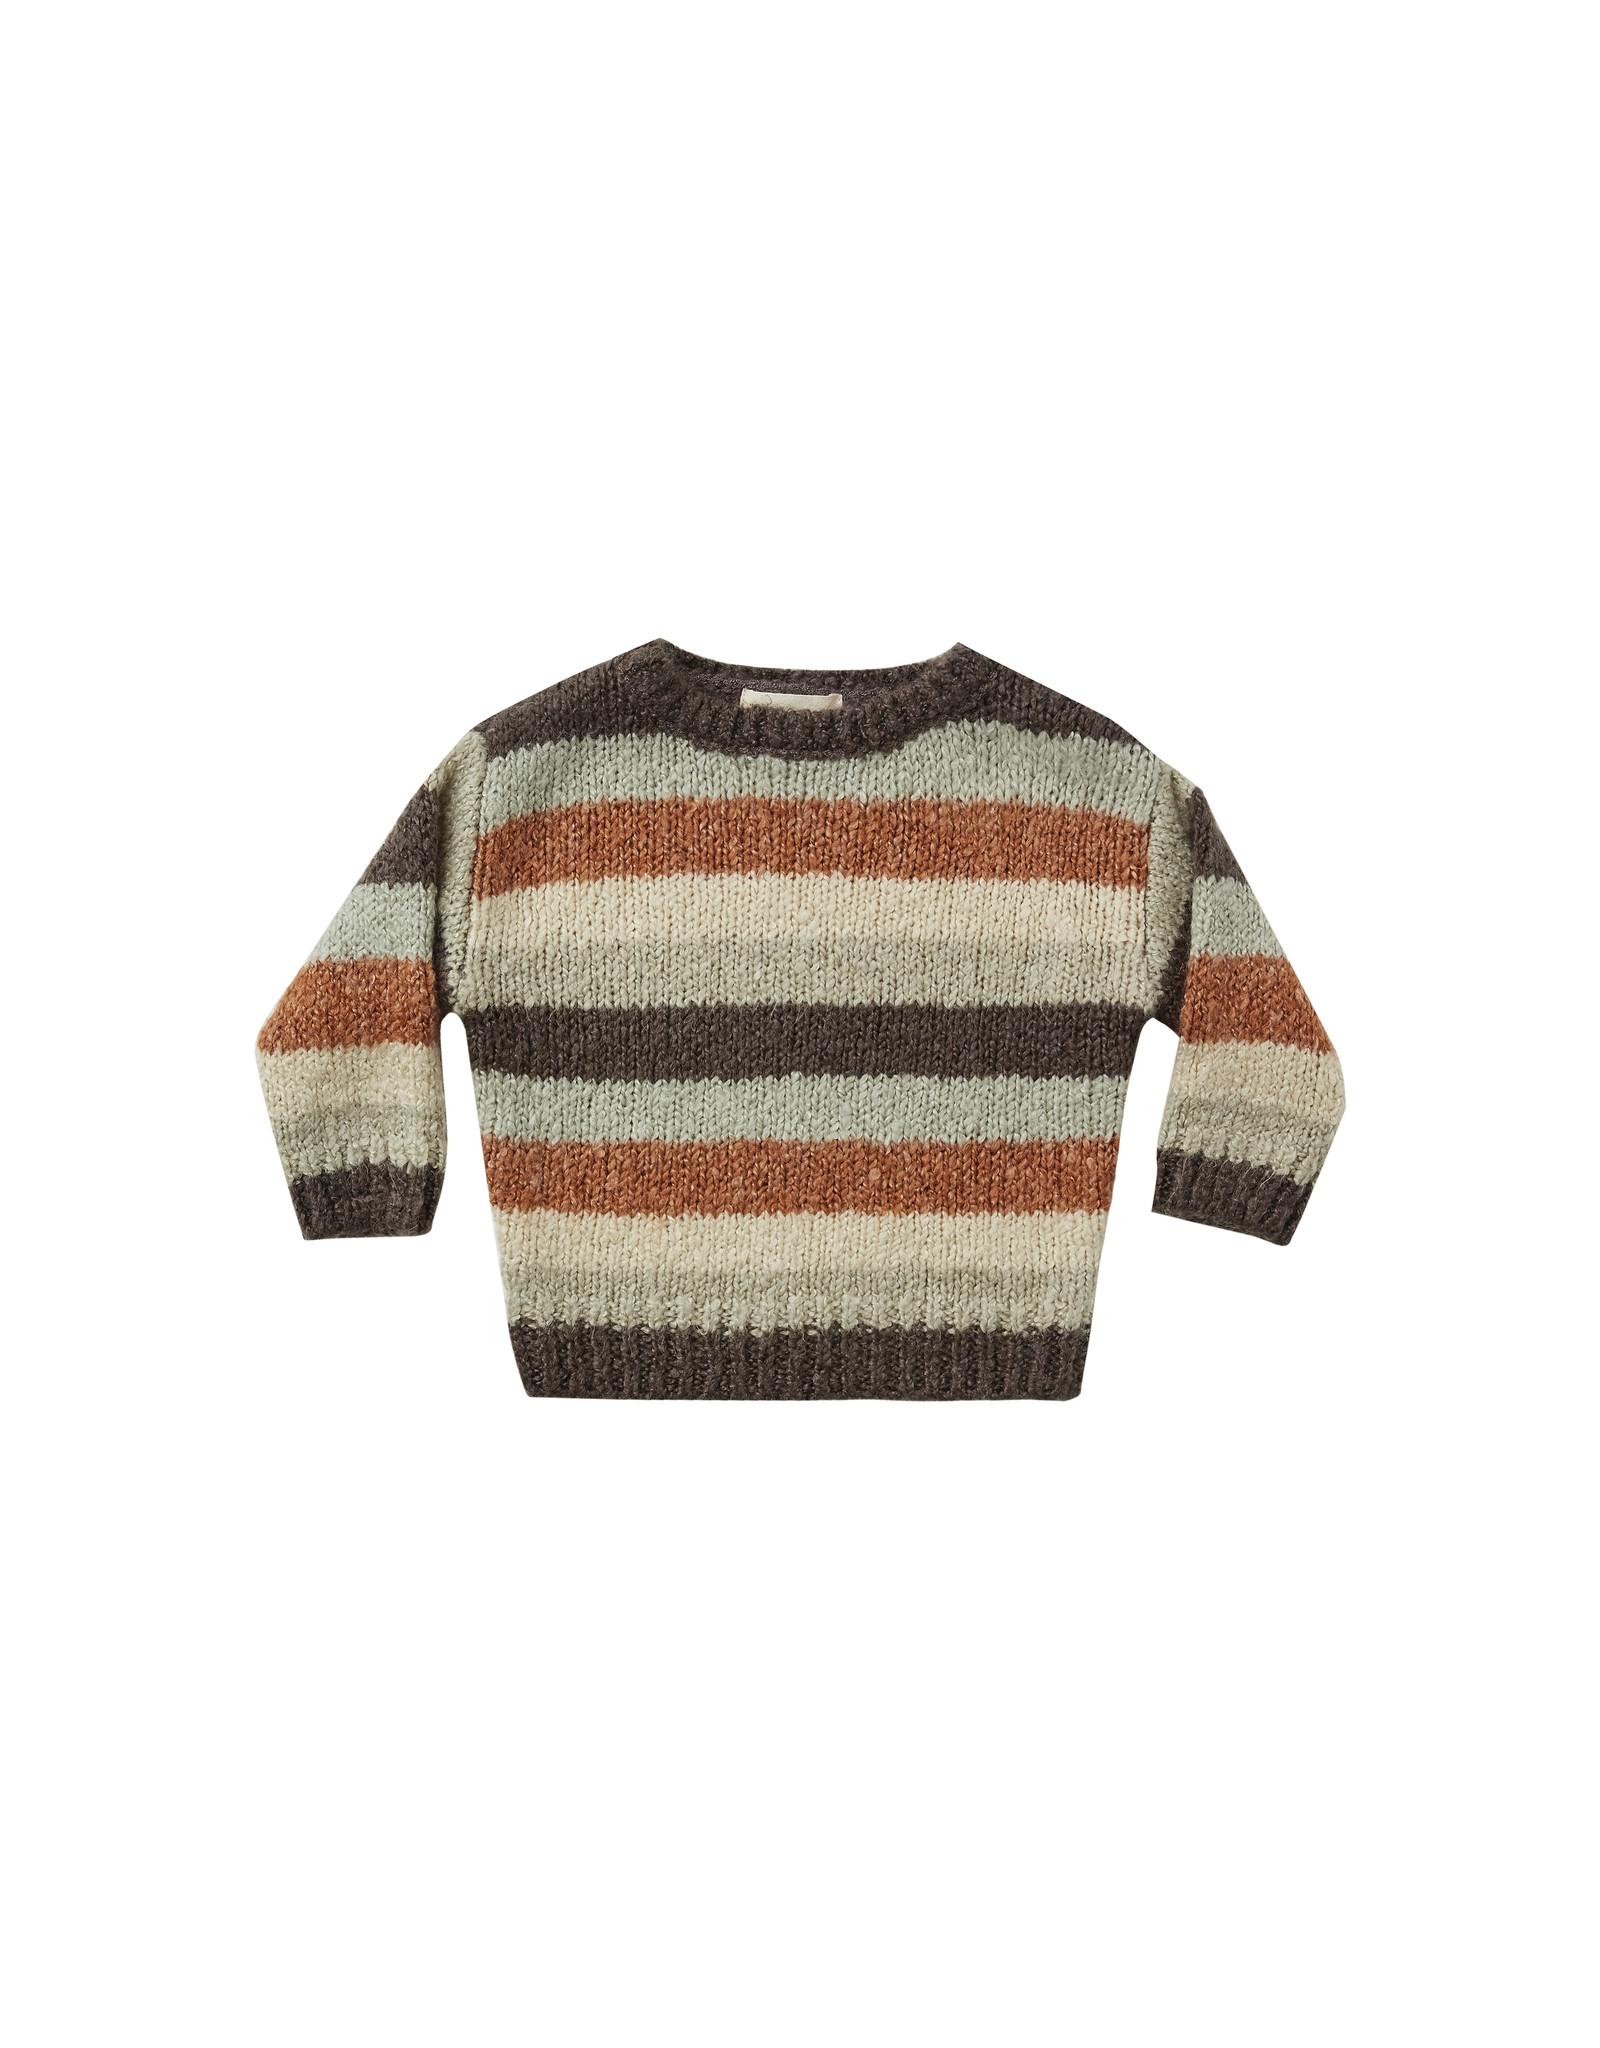 Rylee + Cru Aspen Sweater